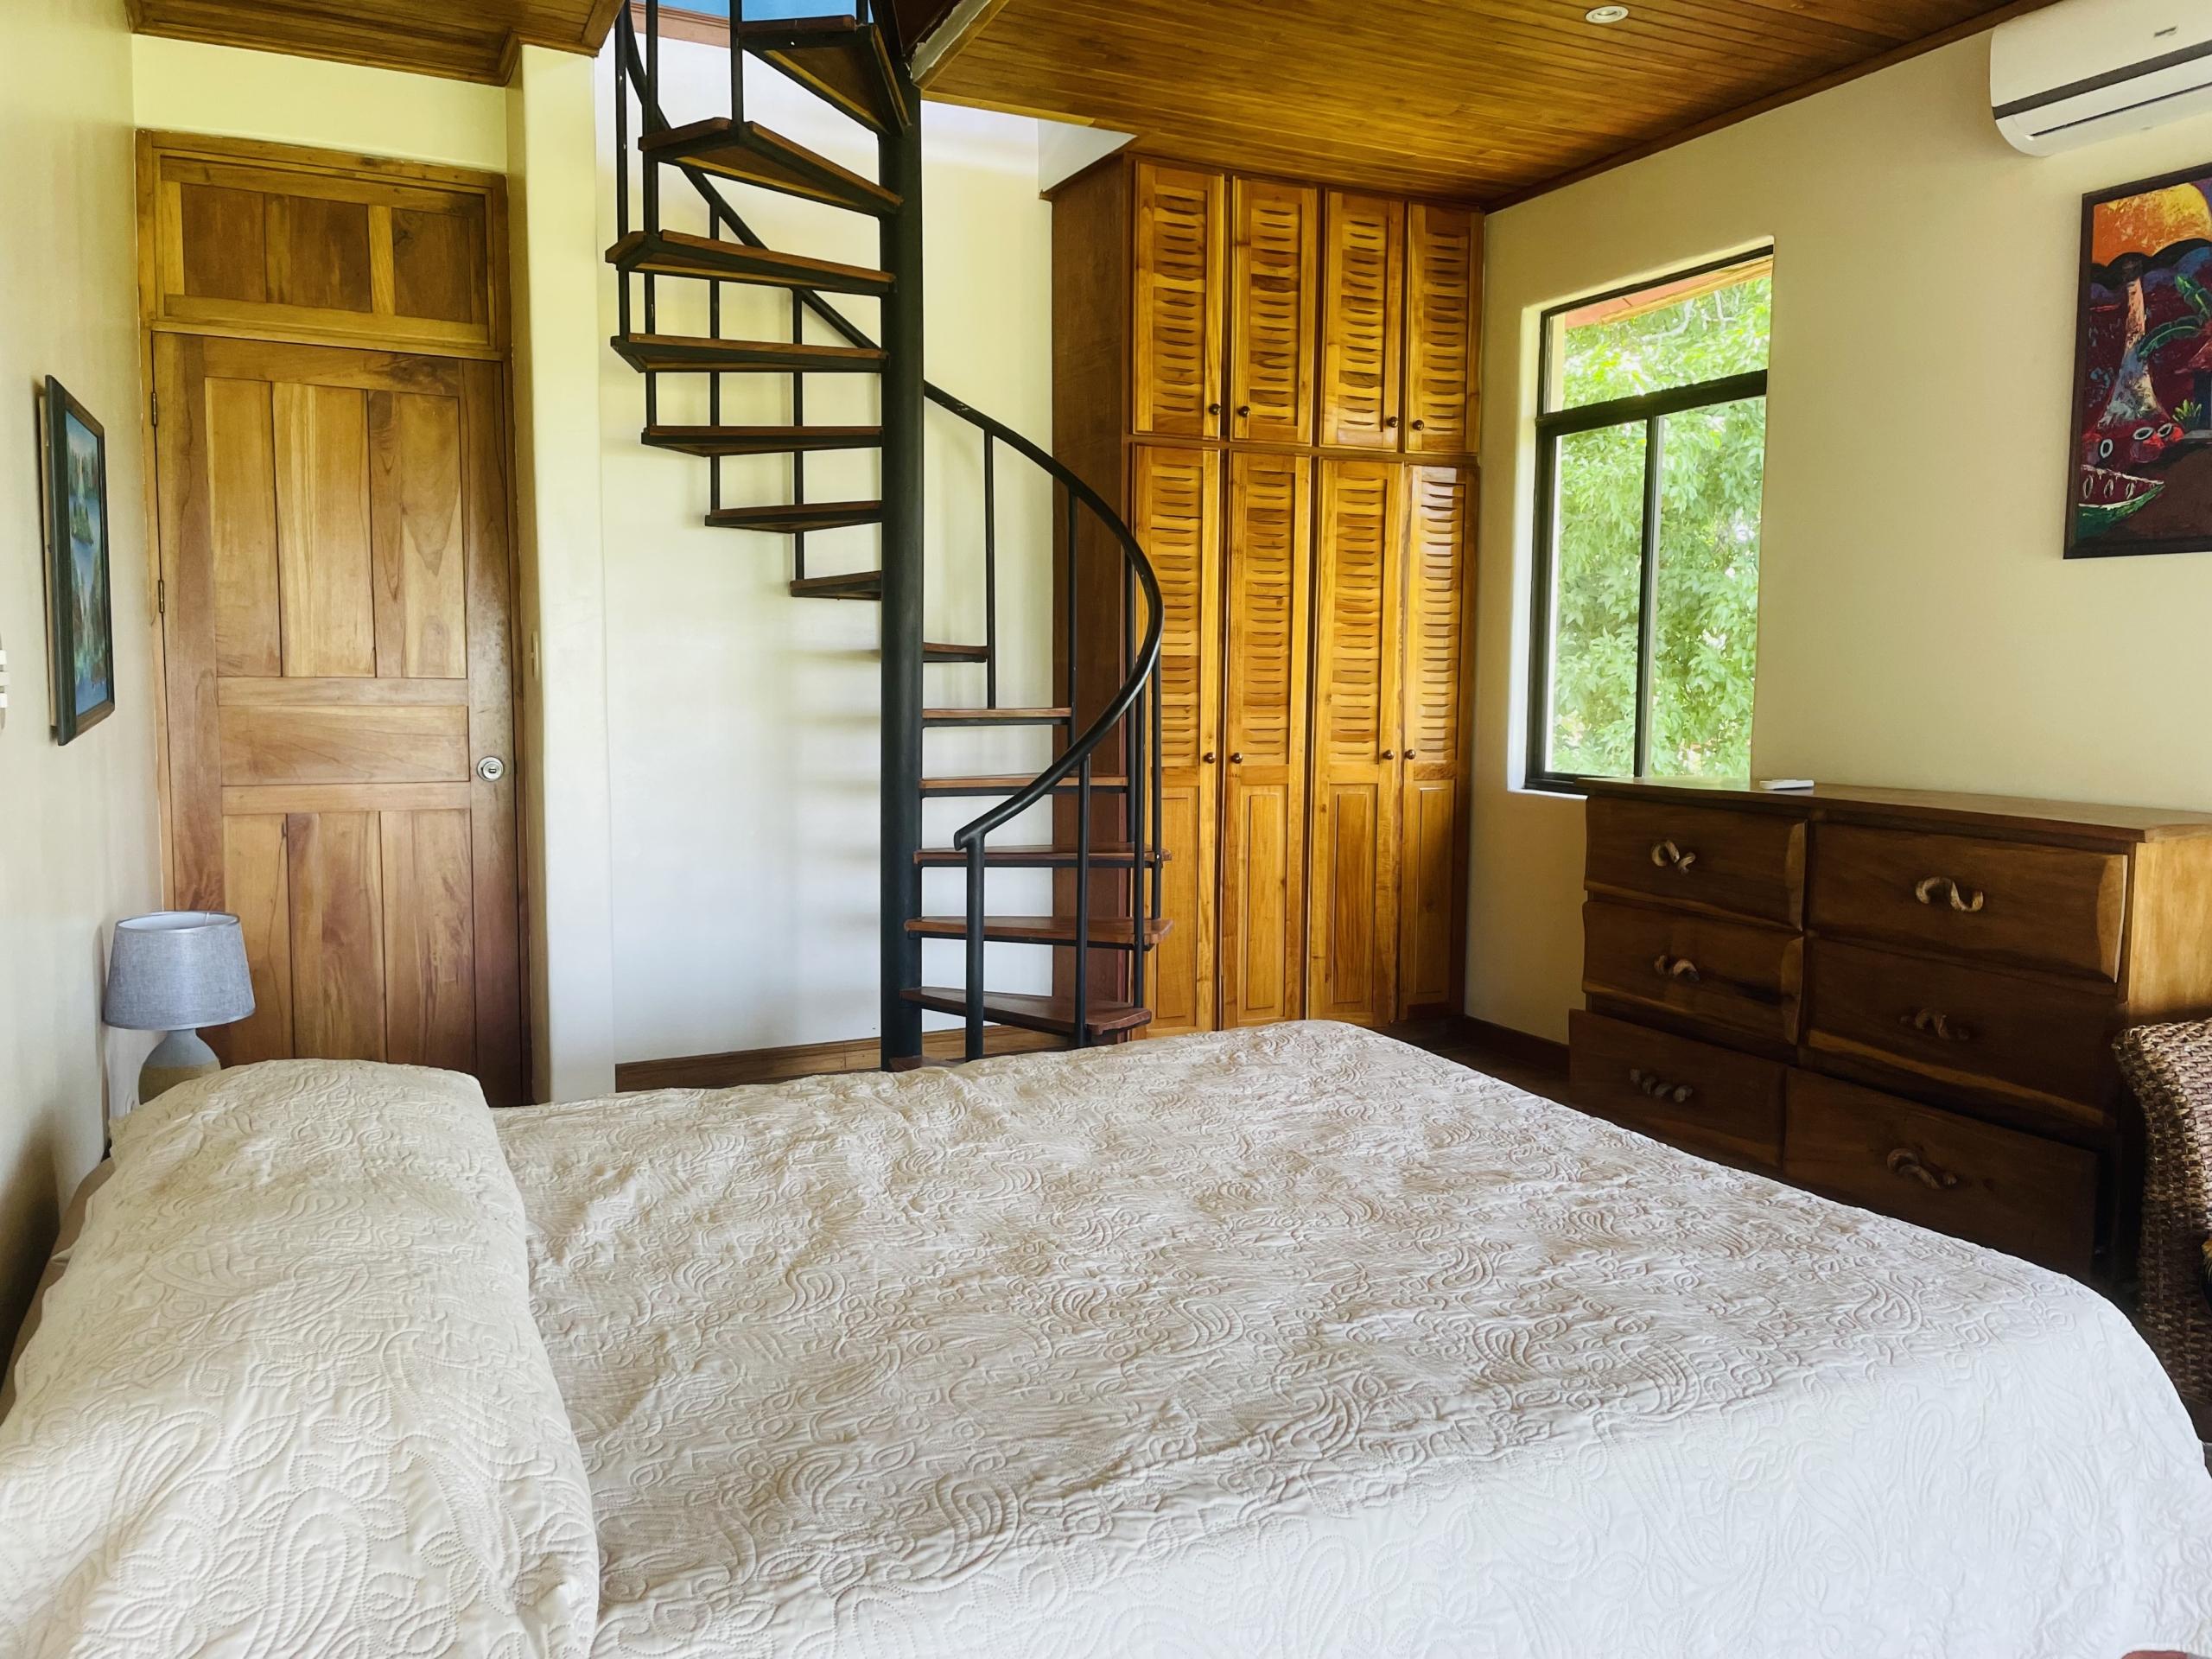 boca-barranca-costa-rica-villa-bedroom